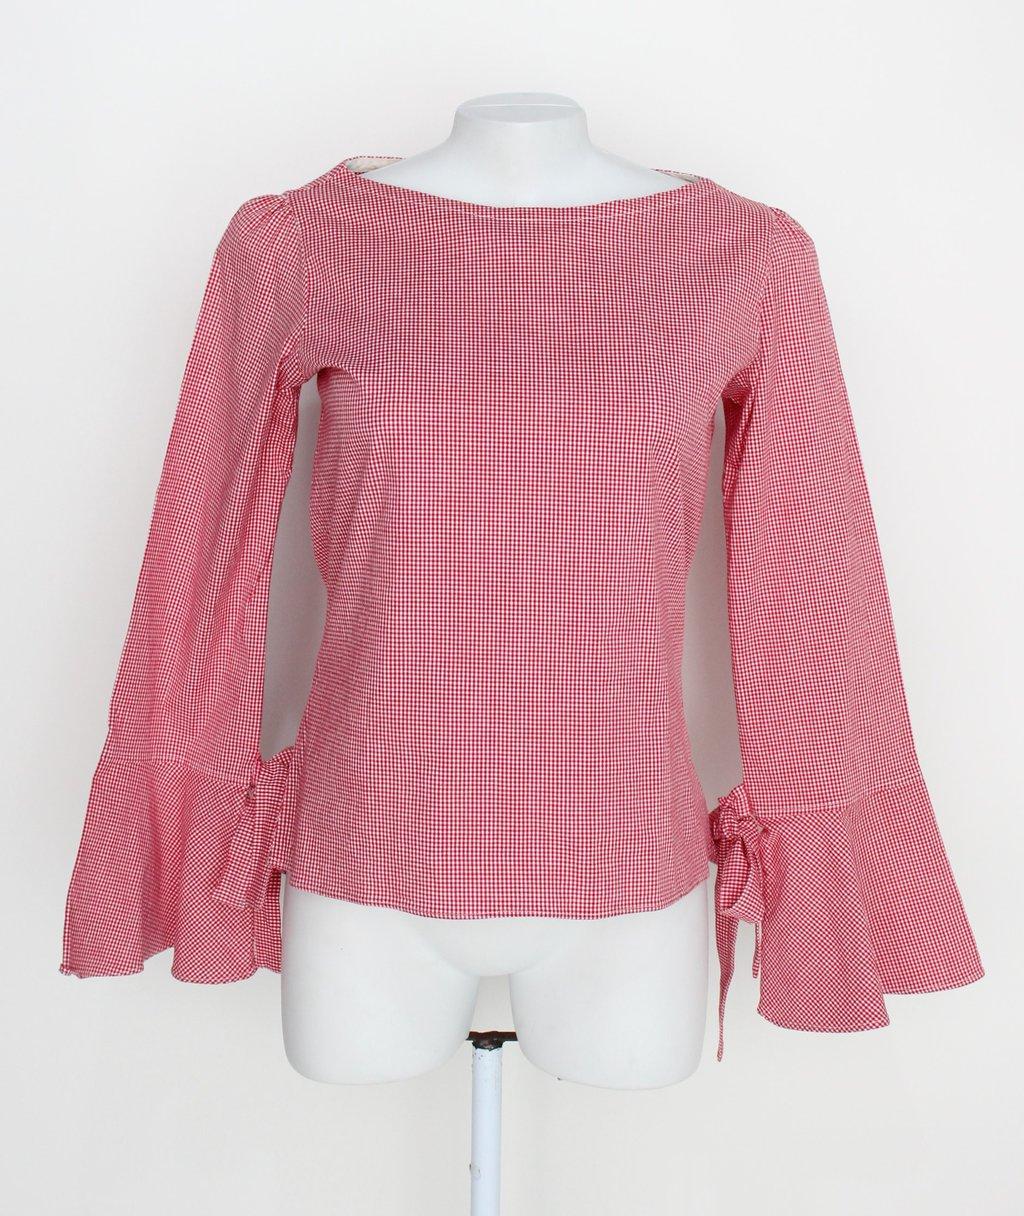 Blusa Feminina Vermelha Estampada